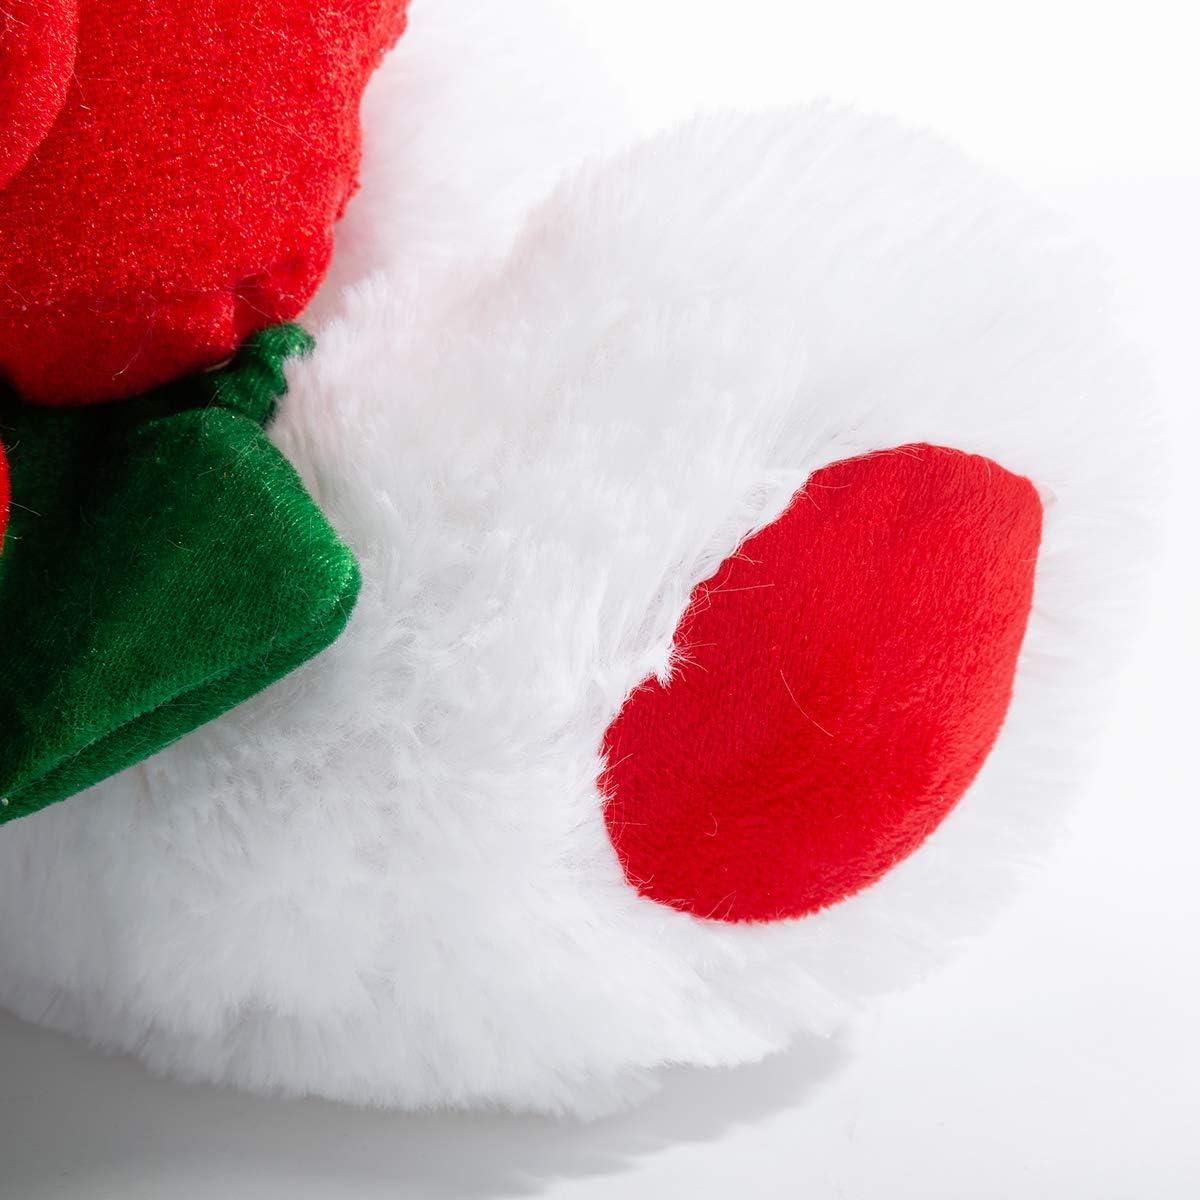 16 Inch White BEJOY Teddy Bear Stuffed Animals Plush Bear Holding Rose Soft Plush Toy Valentines Day